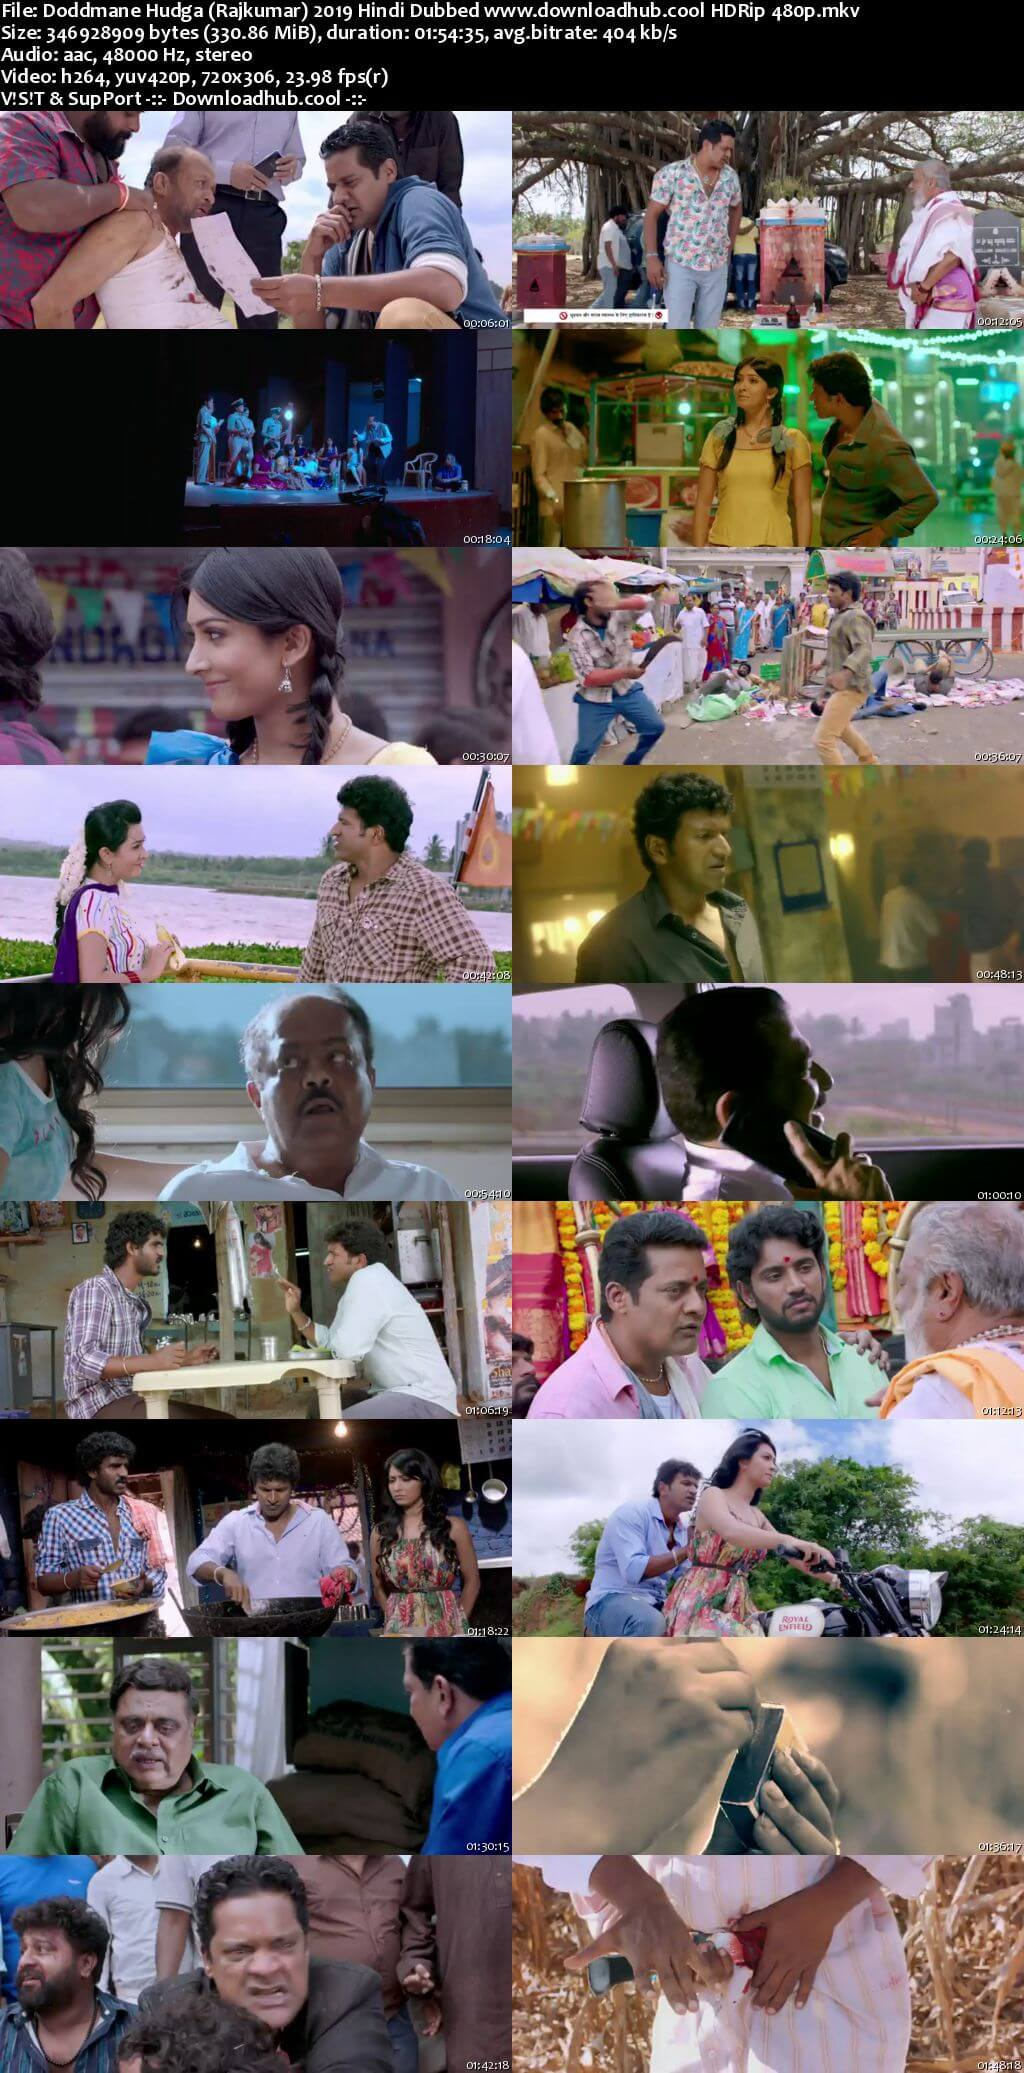 Doddmane Hudga (Rajkumar) 2019 Hindi Dubbed 300MB HDRip 480p